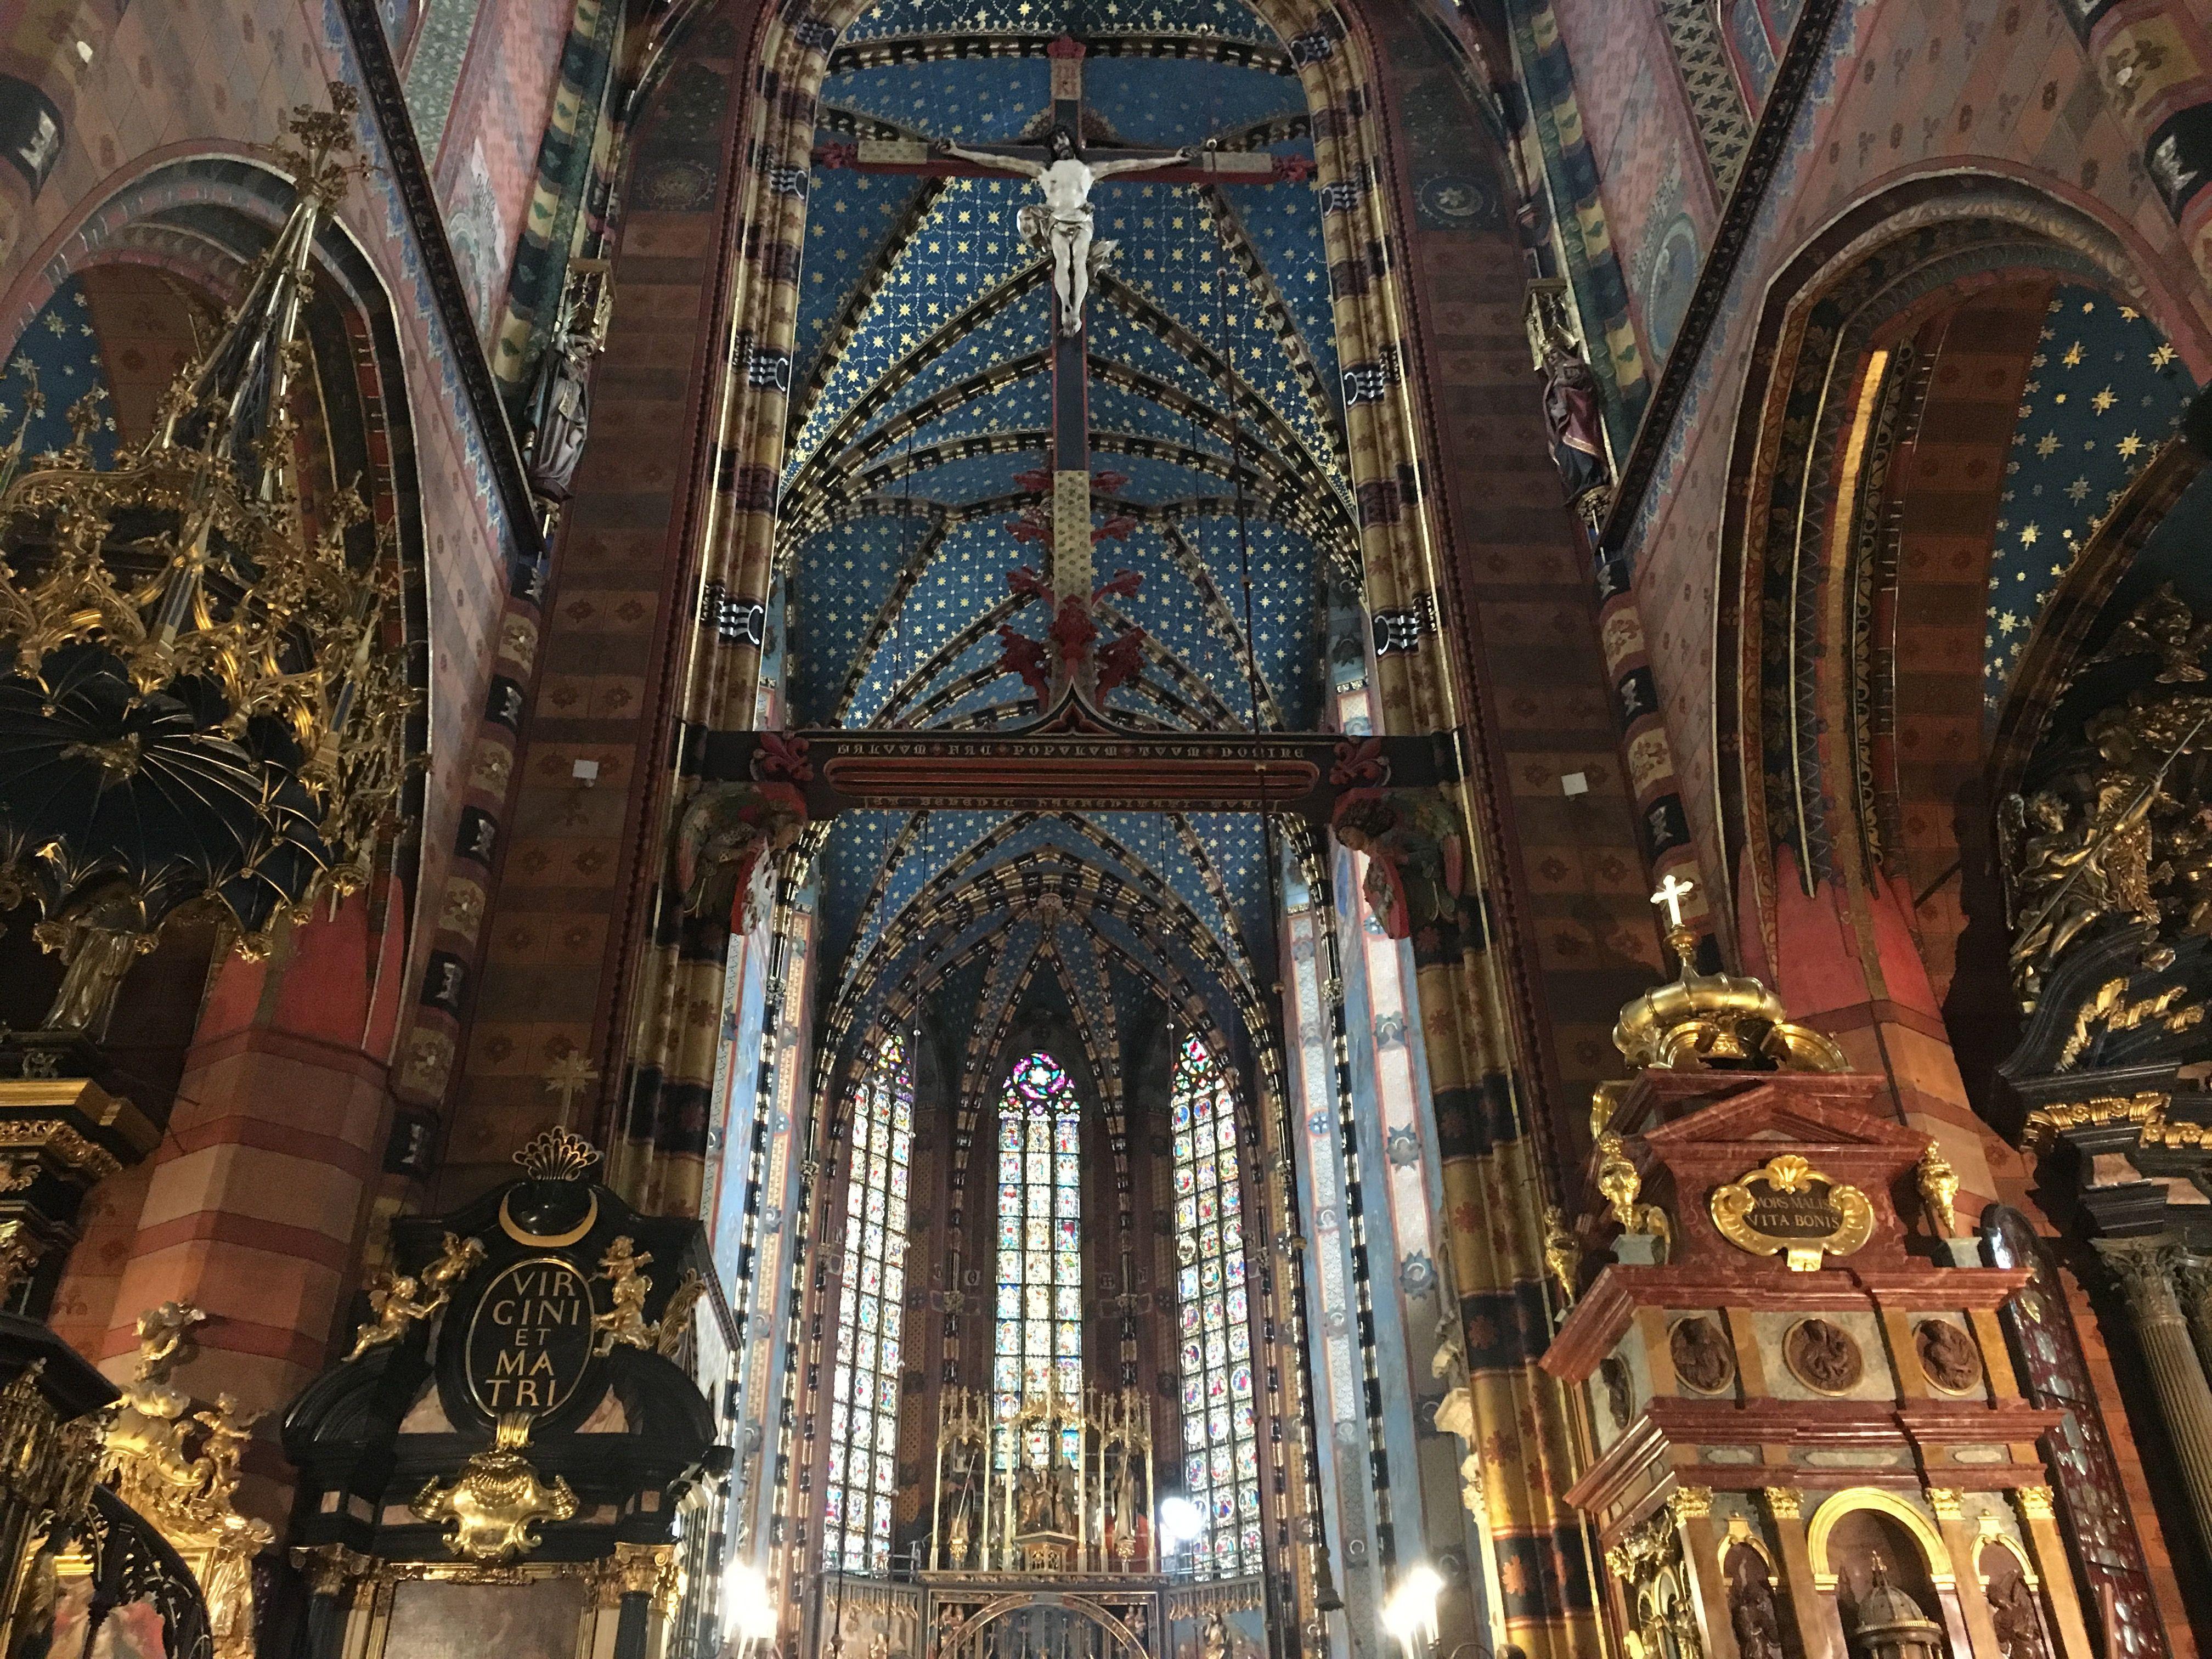 Basílica de Santa María de Cracovia Kościół Wniebowzięcia Najświętszej Maryi Panny